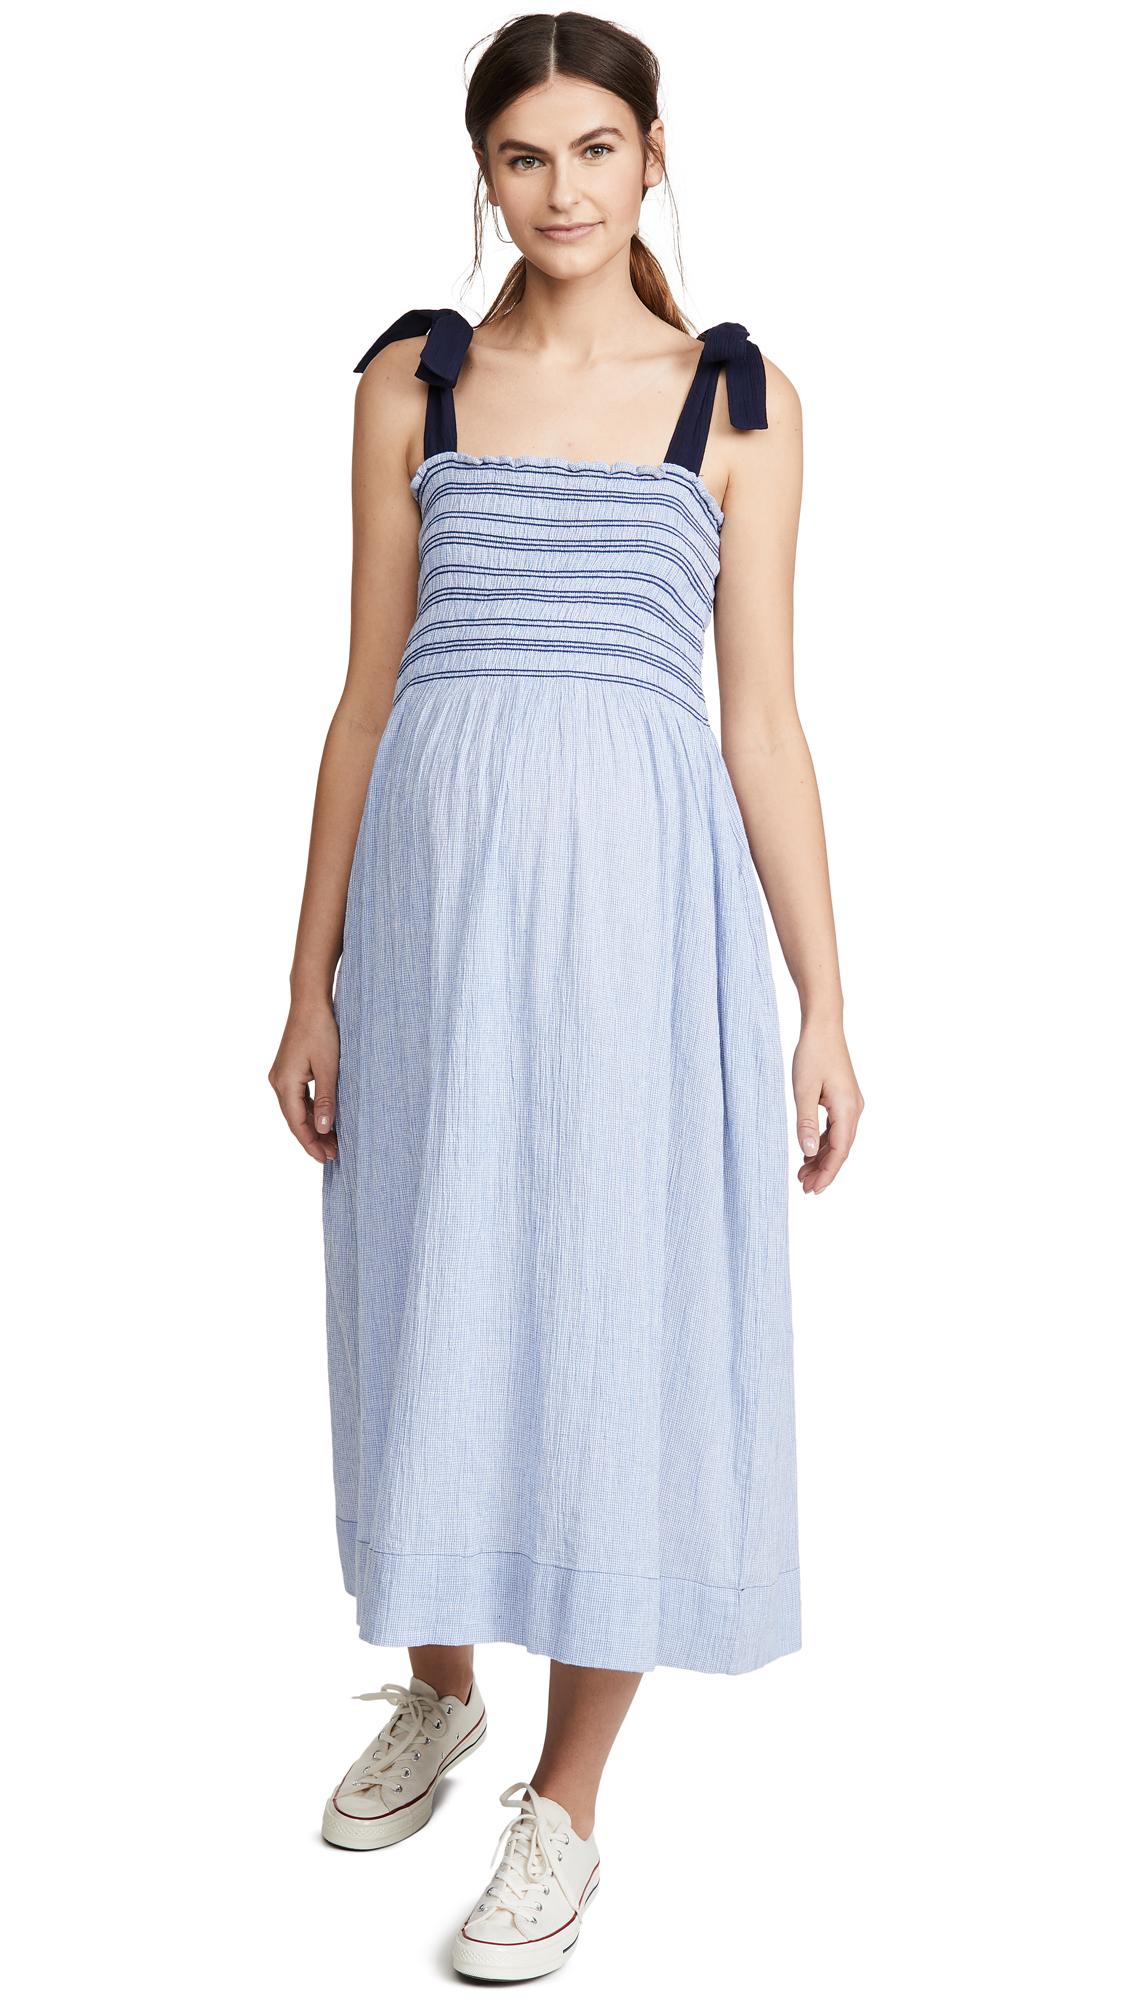 HATCH The Margaux Dress - 30% Off Sale